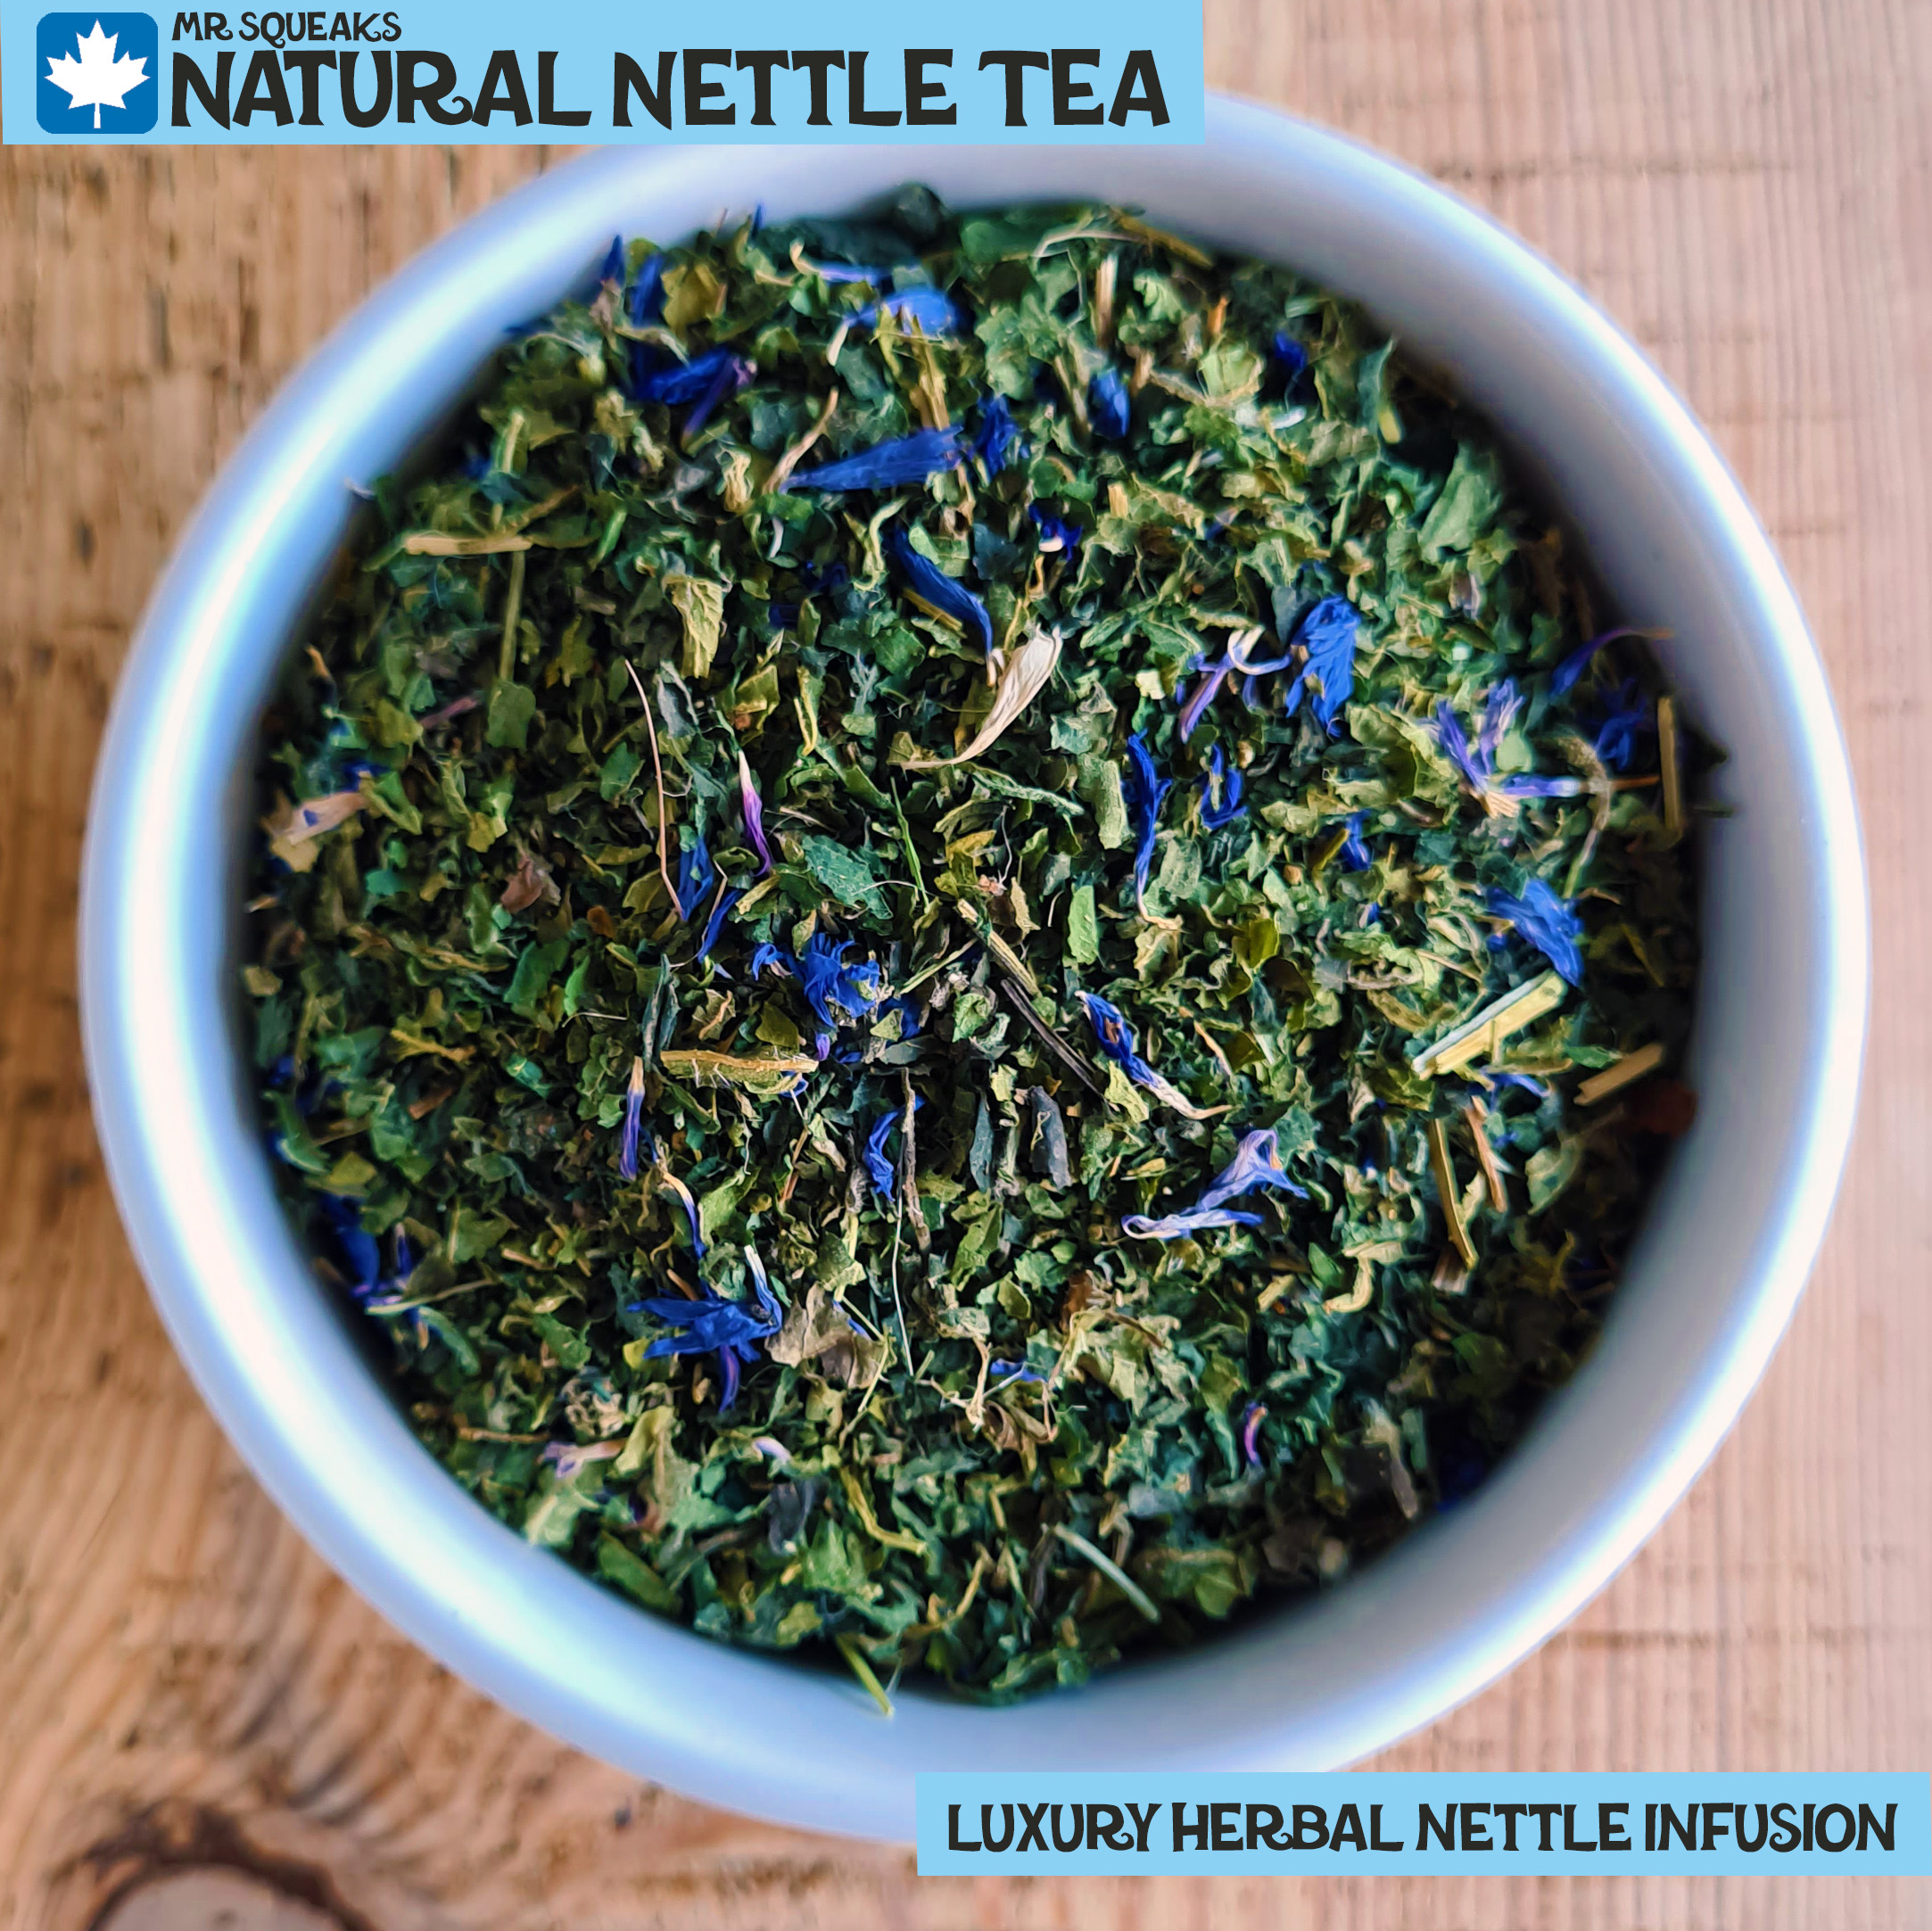 Natural Nettle Tea